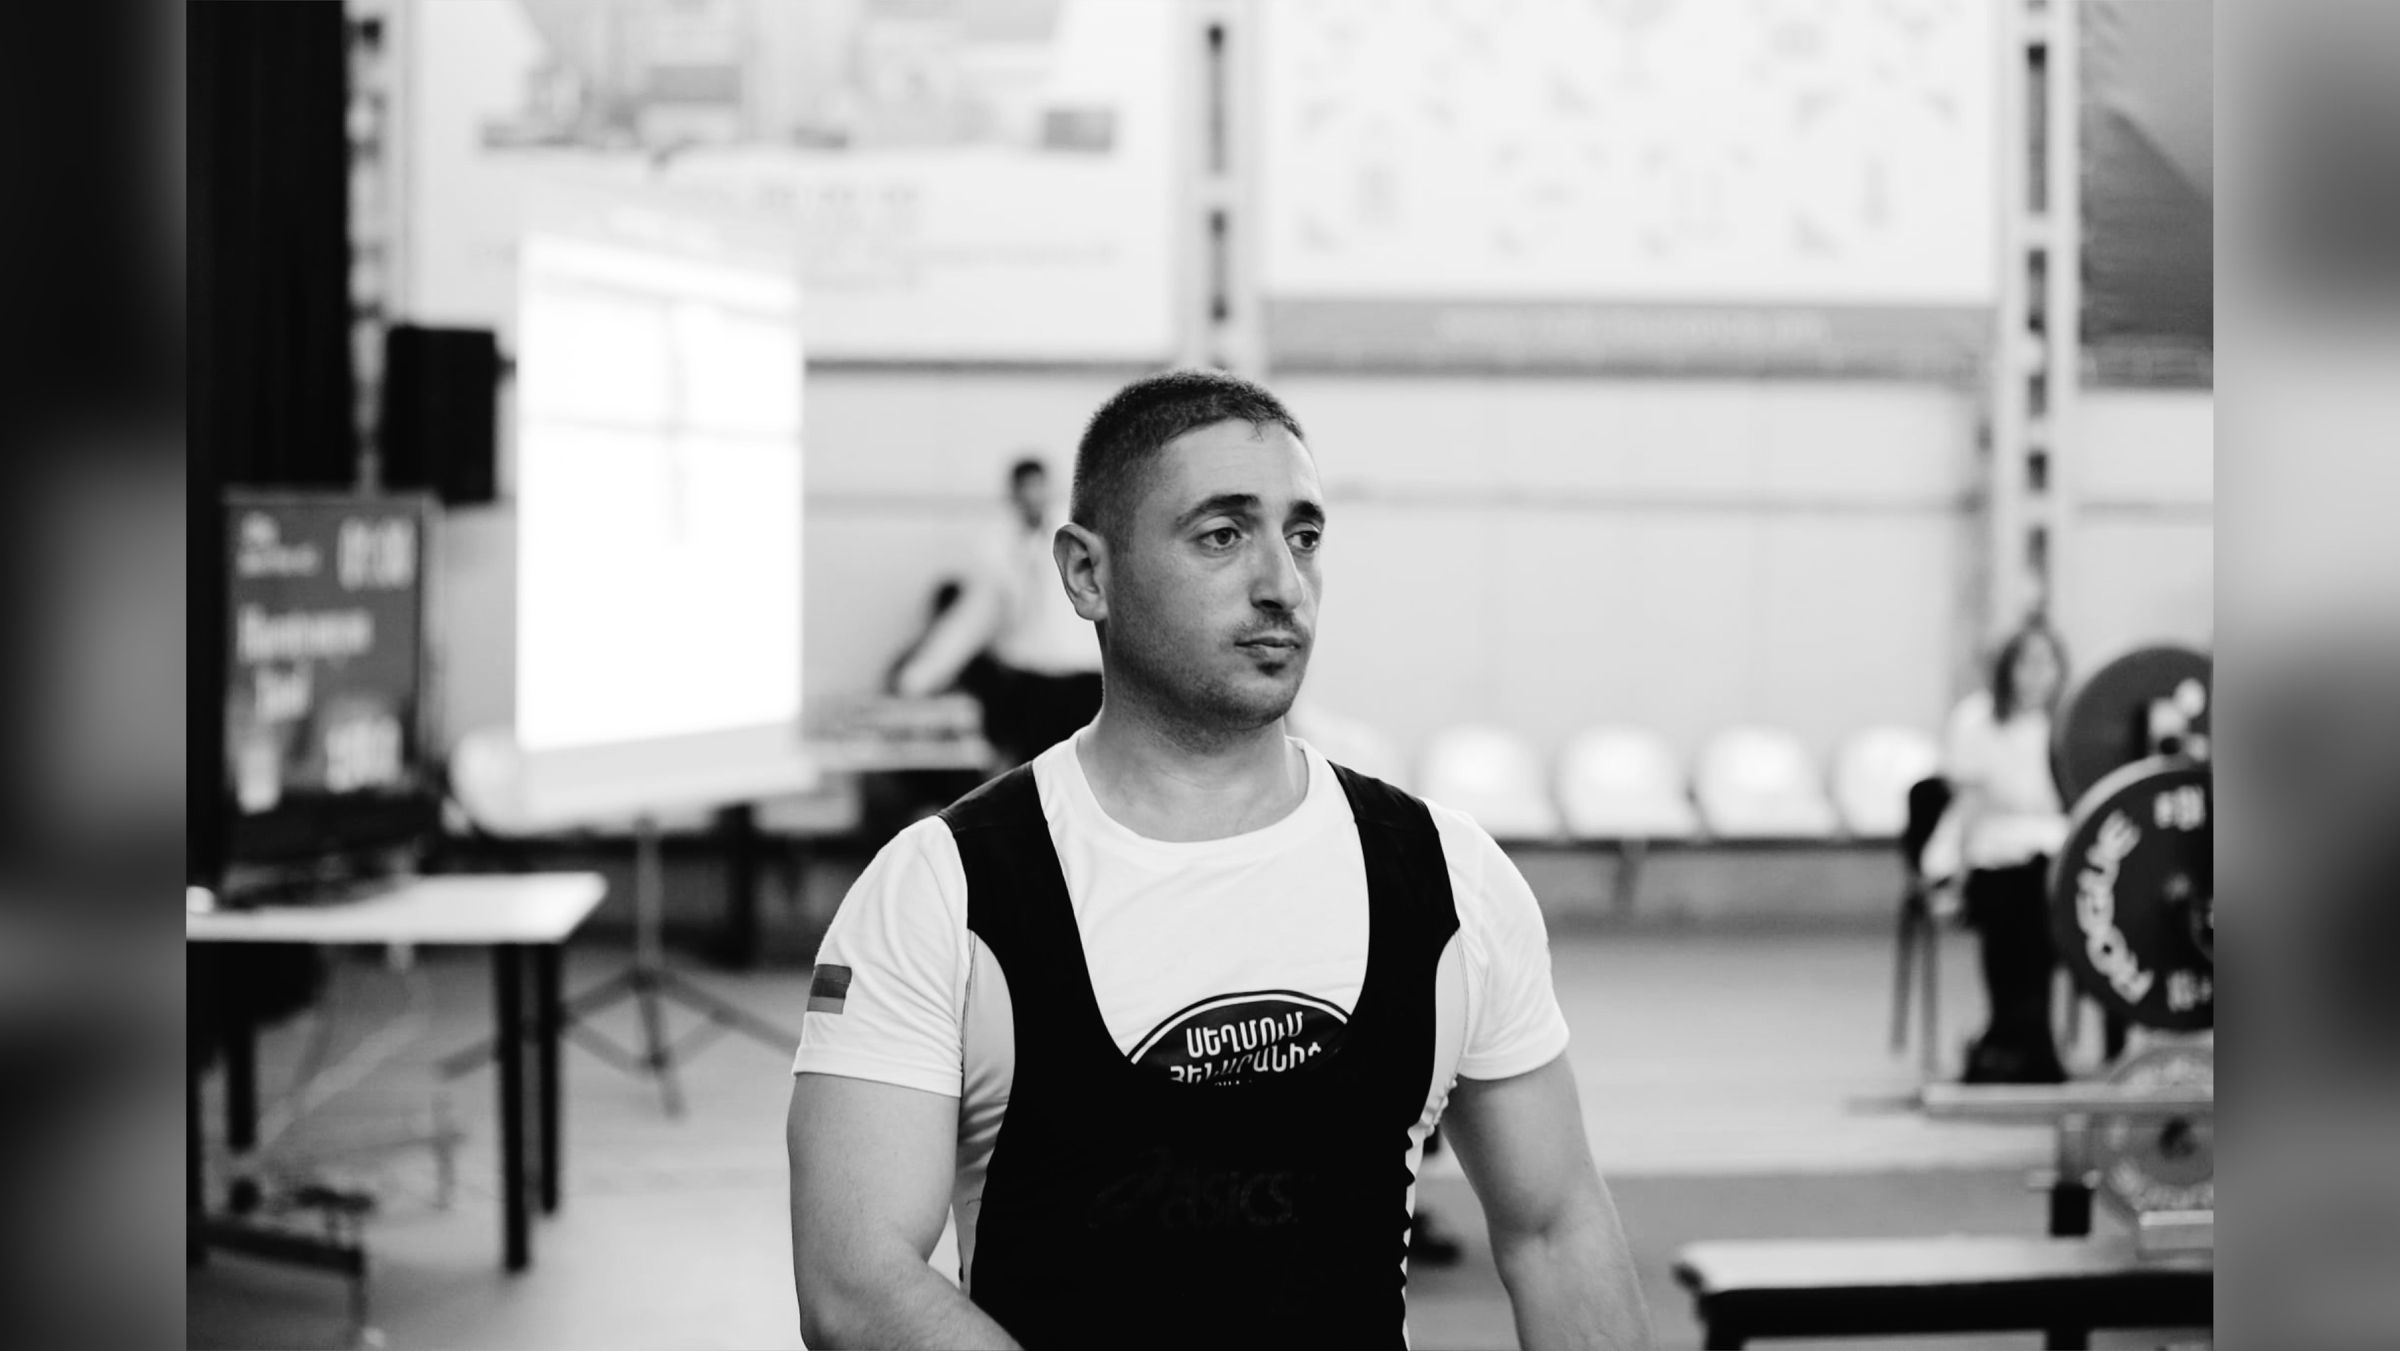 "<p>Татул Арутюнян. Фото © Facebook / <a href=""https://www.facebook.com/powerliftingarm/photos/pcb.969645560187641/969643860187811"" target=""_blank"" rel=""noopener noreferrer"">Armenian Powerlifting Federation</a></p>"